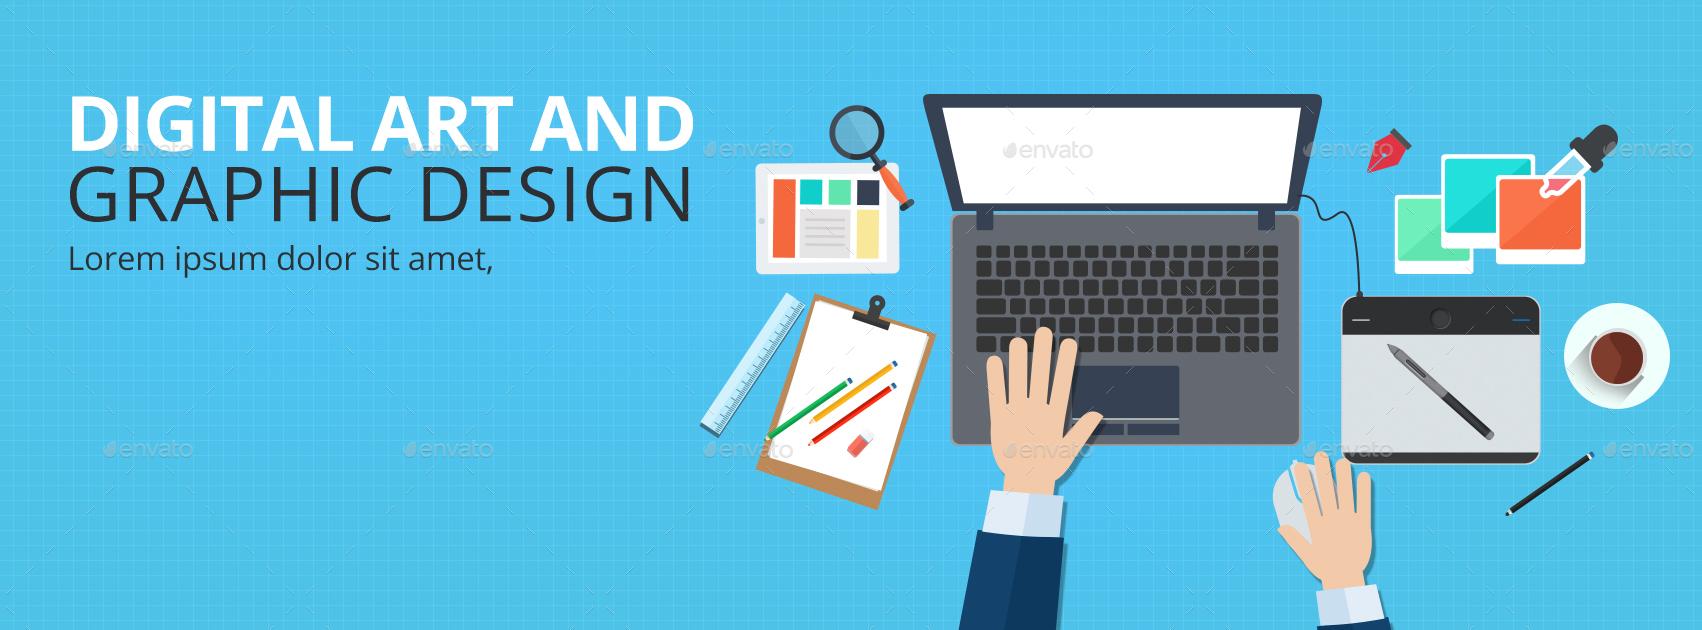 Web Design Facebook Cover Bundle - 9 Designs by doto | GraphicRiver